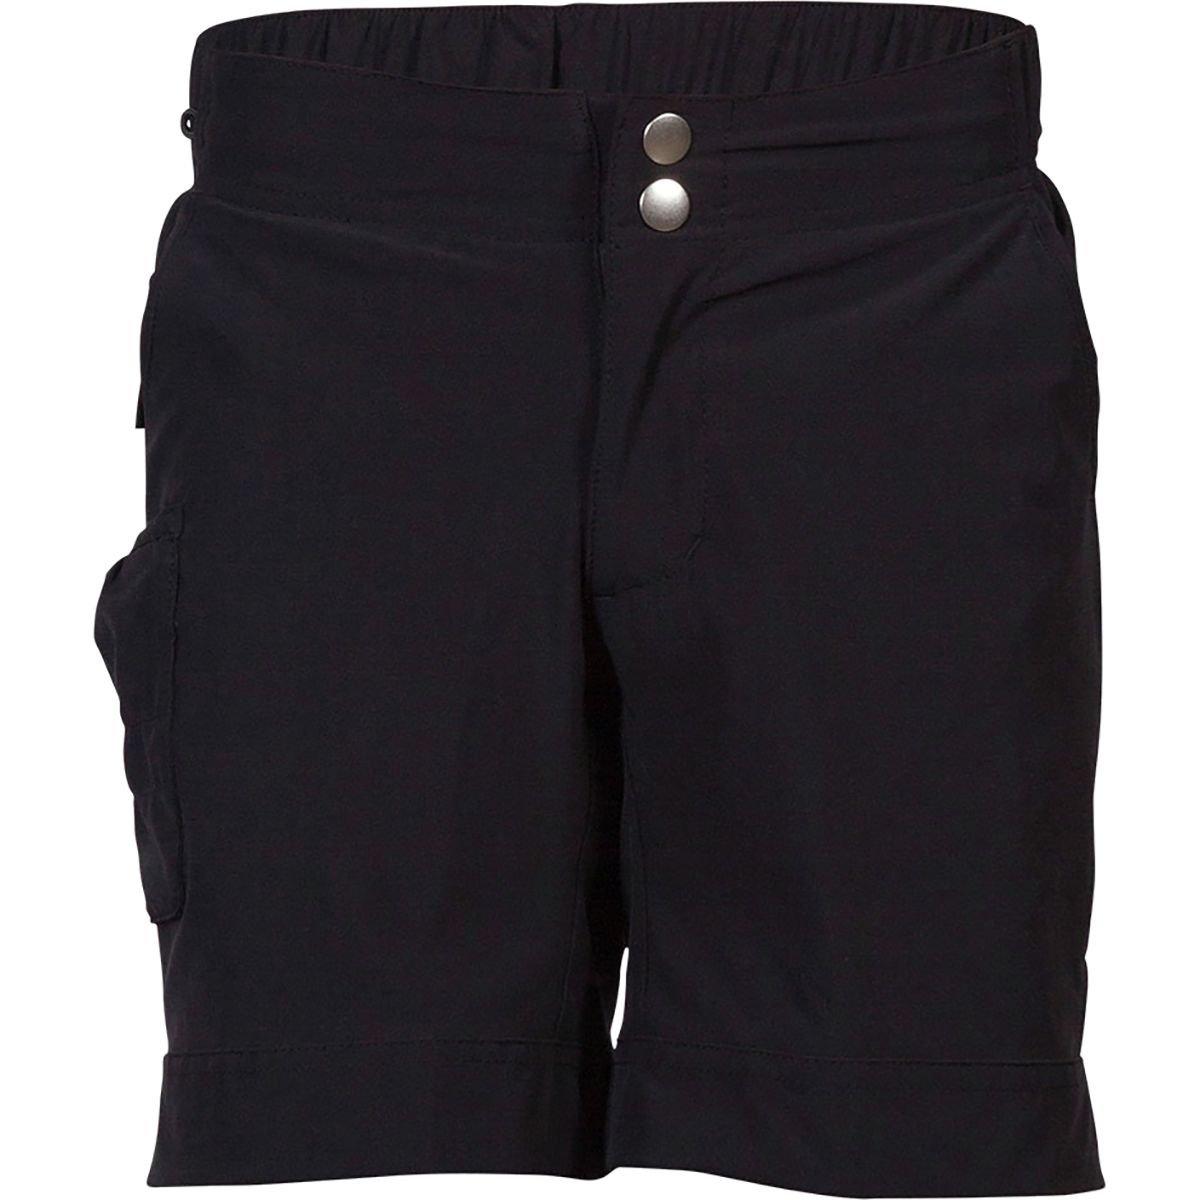 Zoic Girl's Rippette Bike Shorts, Black, XX-Large by Zoic